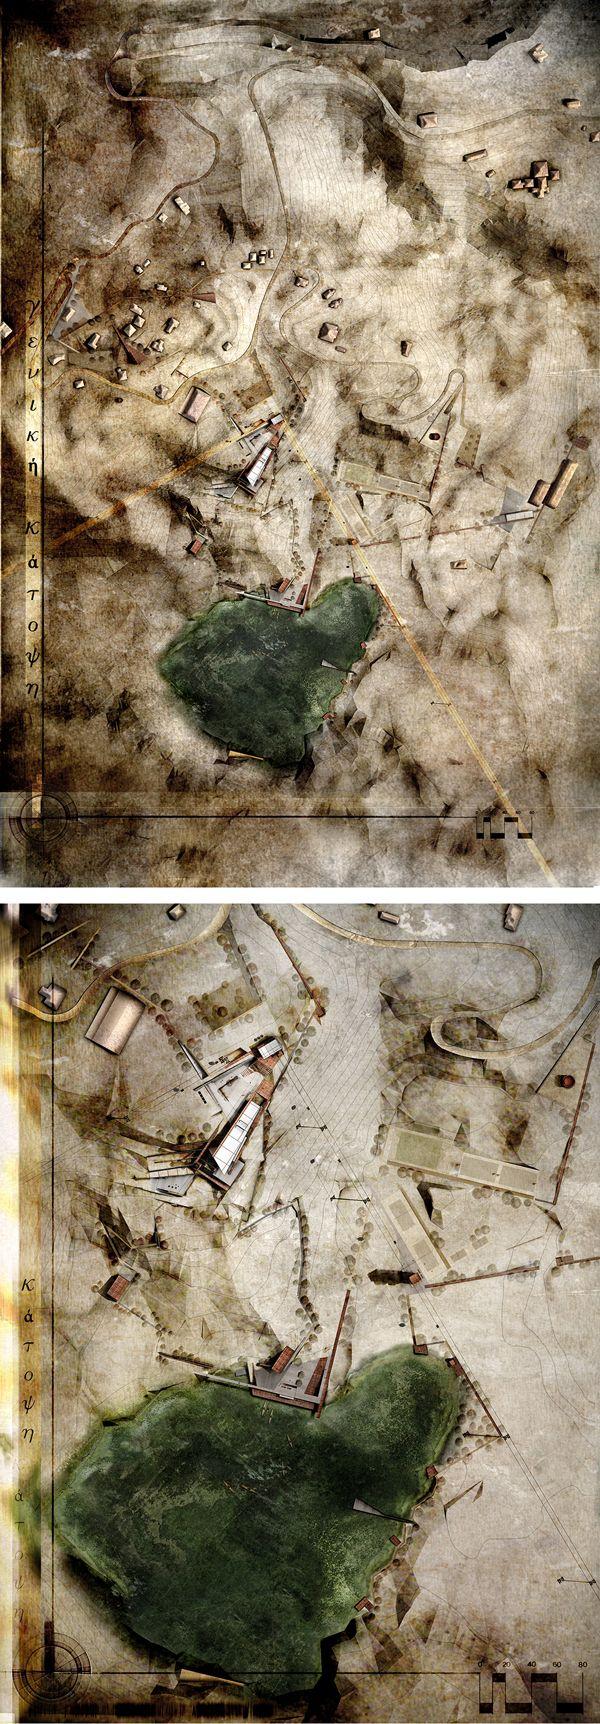 #situation http://www.greekarchitects.gr/gr/συμμετοχές-2013/13213-ανάπλαση-αποκατάσταση-ανενεργού-λατομείου-με-χωροθέτηση-χρήσεων-τουρισμού-αναψυχής-και-περιβαλλοντικής-εκπαίδευσης-id8444